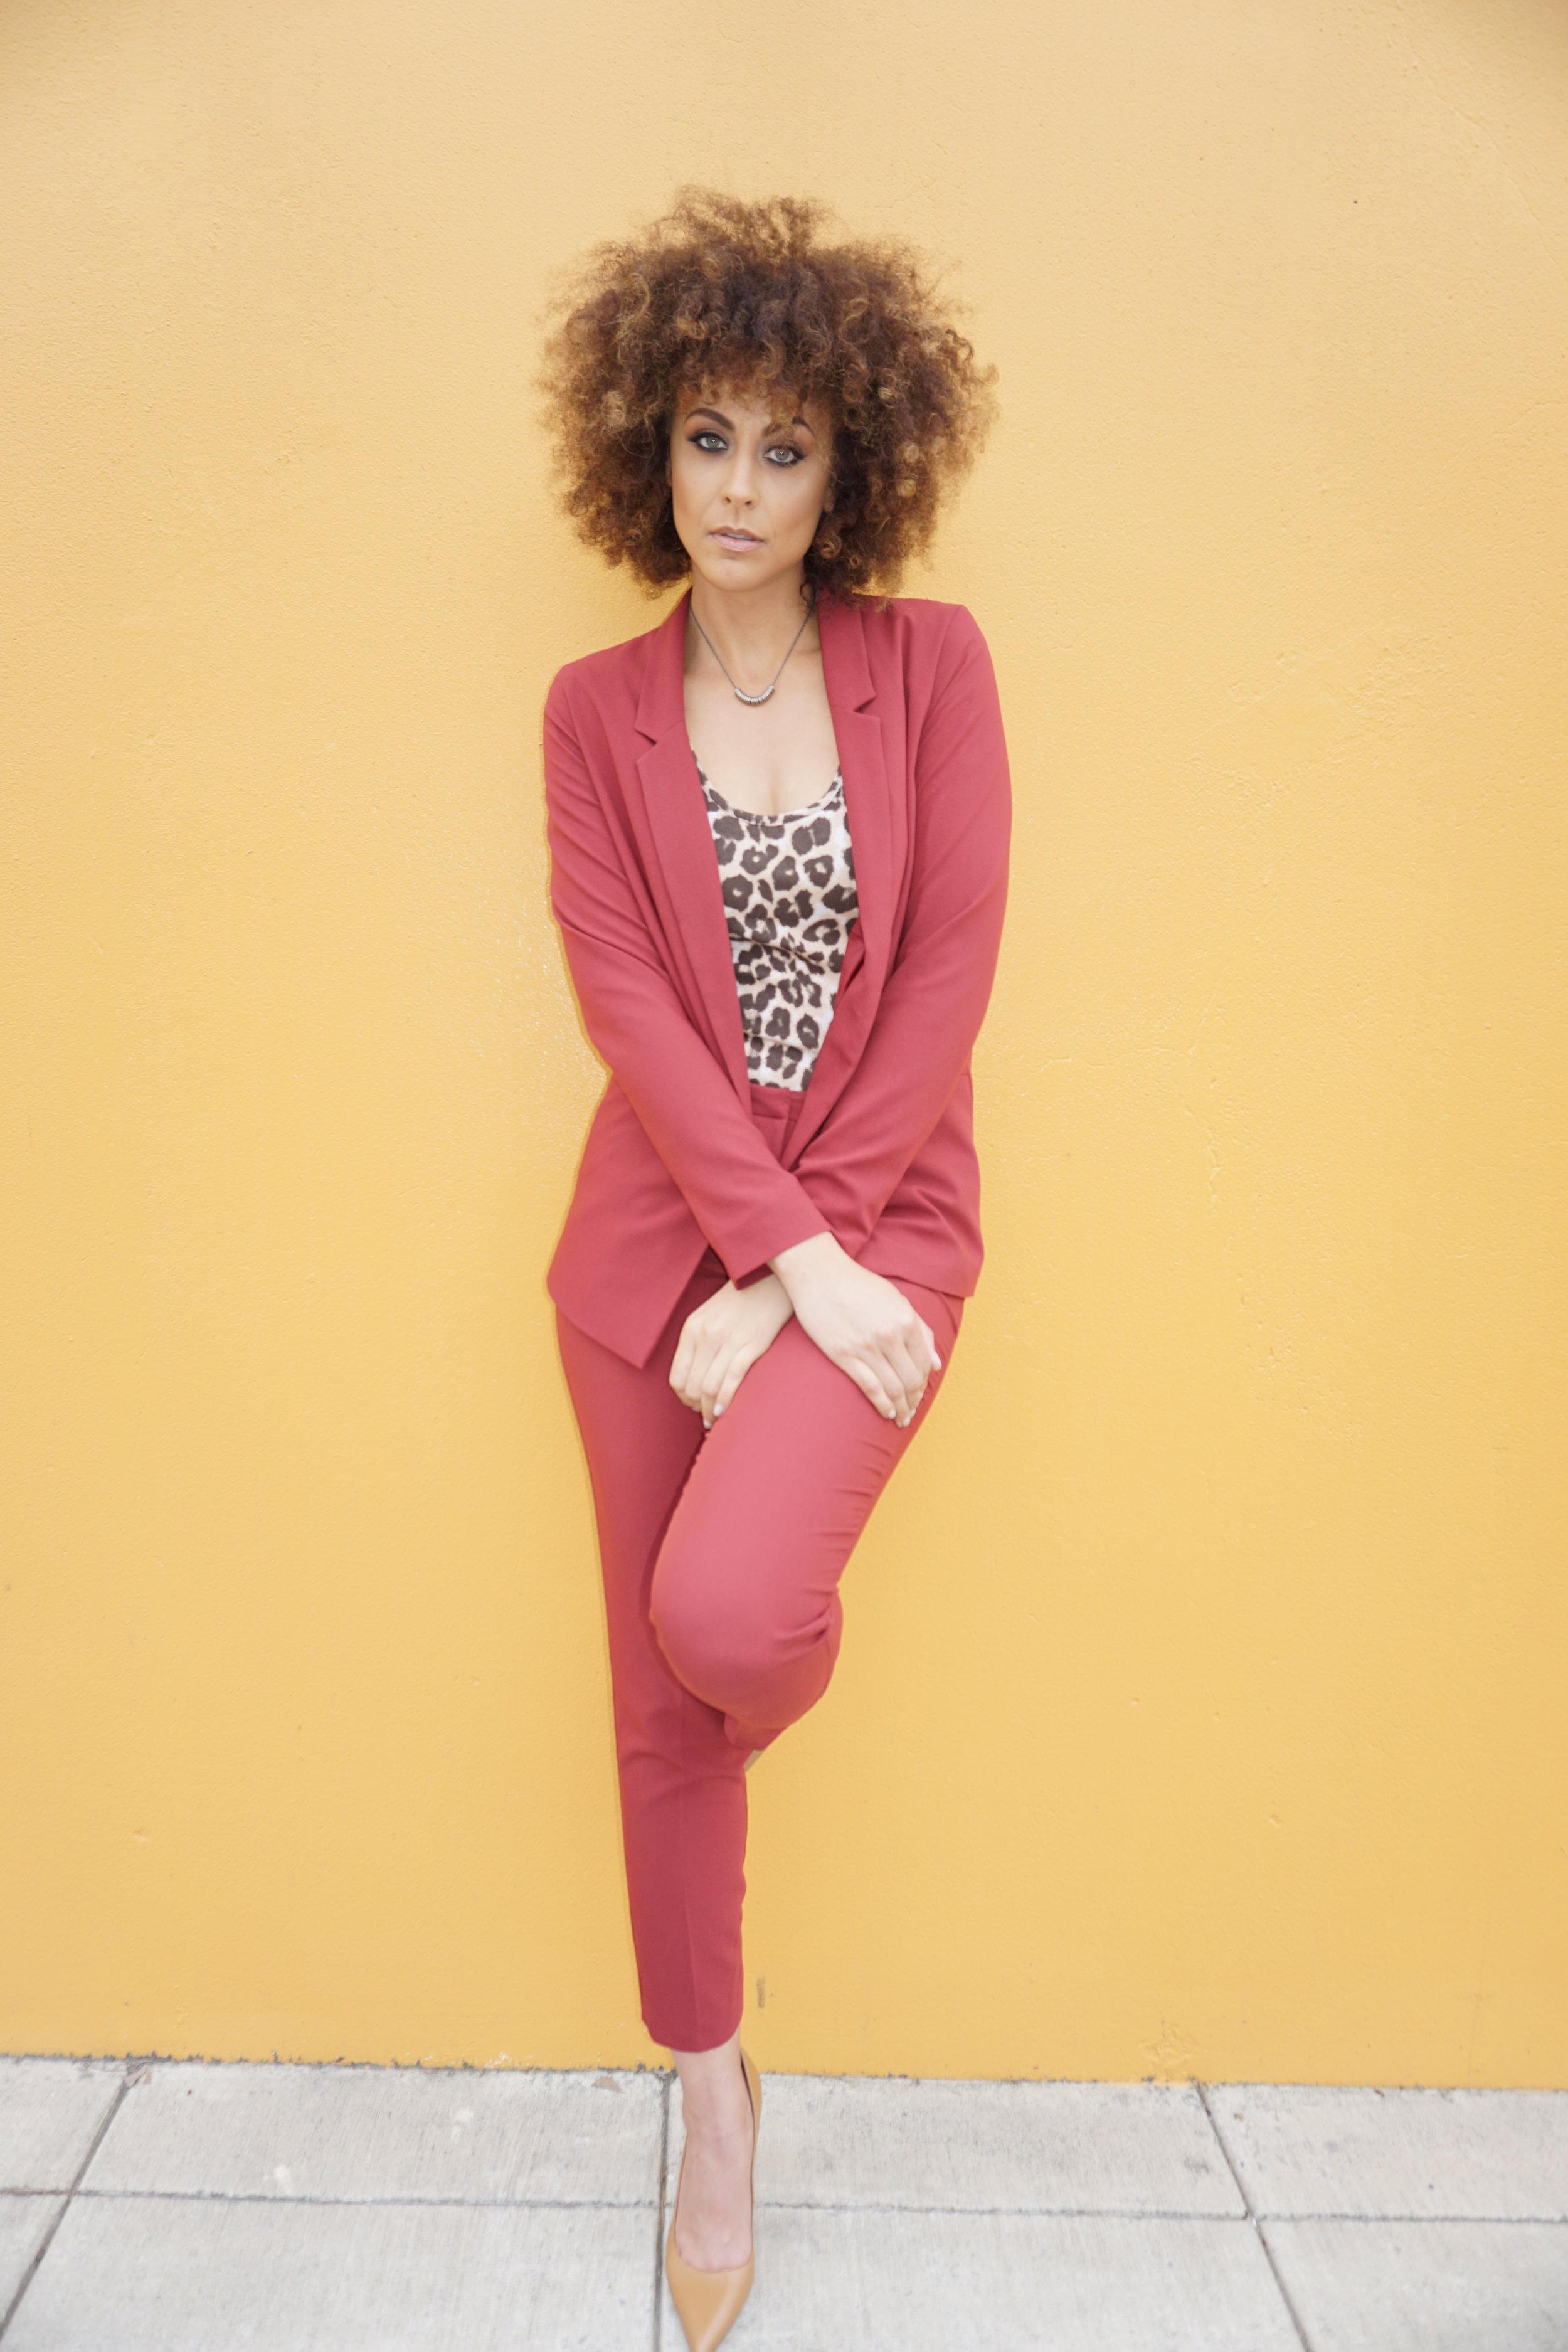 Tall suit -  ASOS /Tall Bodysuit -  ASOS /Necklace -  Candid Art /Shoes - Calvin Klein via Nordstrom Rack  Photography and makeup -  Nikki Notarte